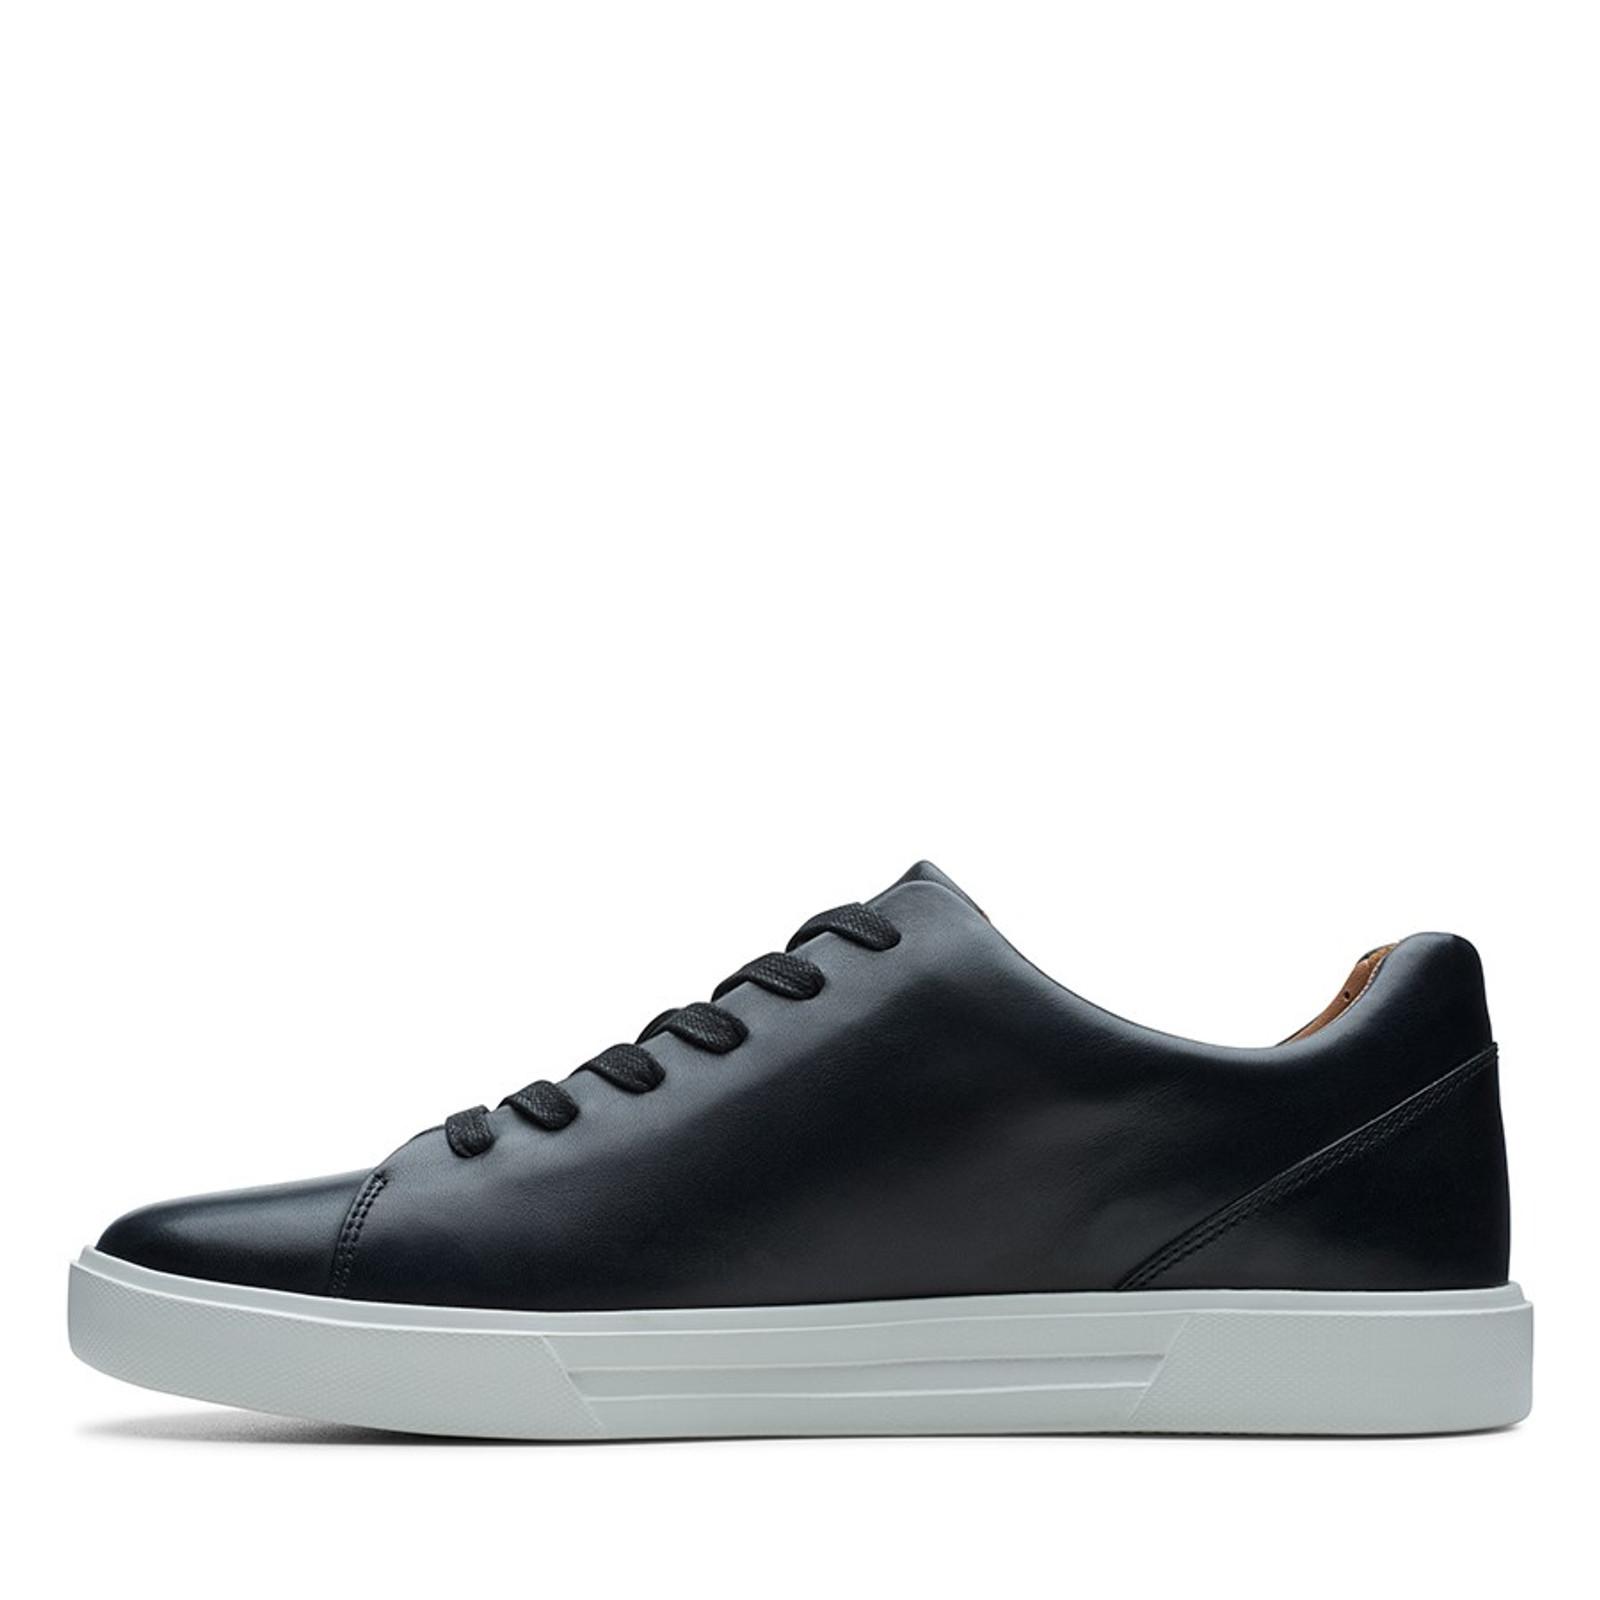 Clarks Mens UN COSTA LACE Black Leather